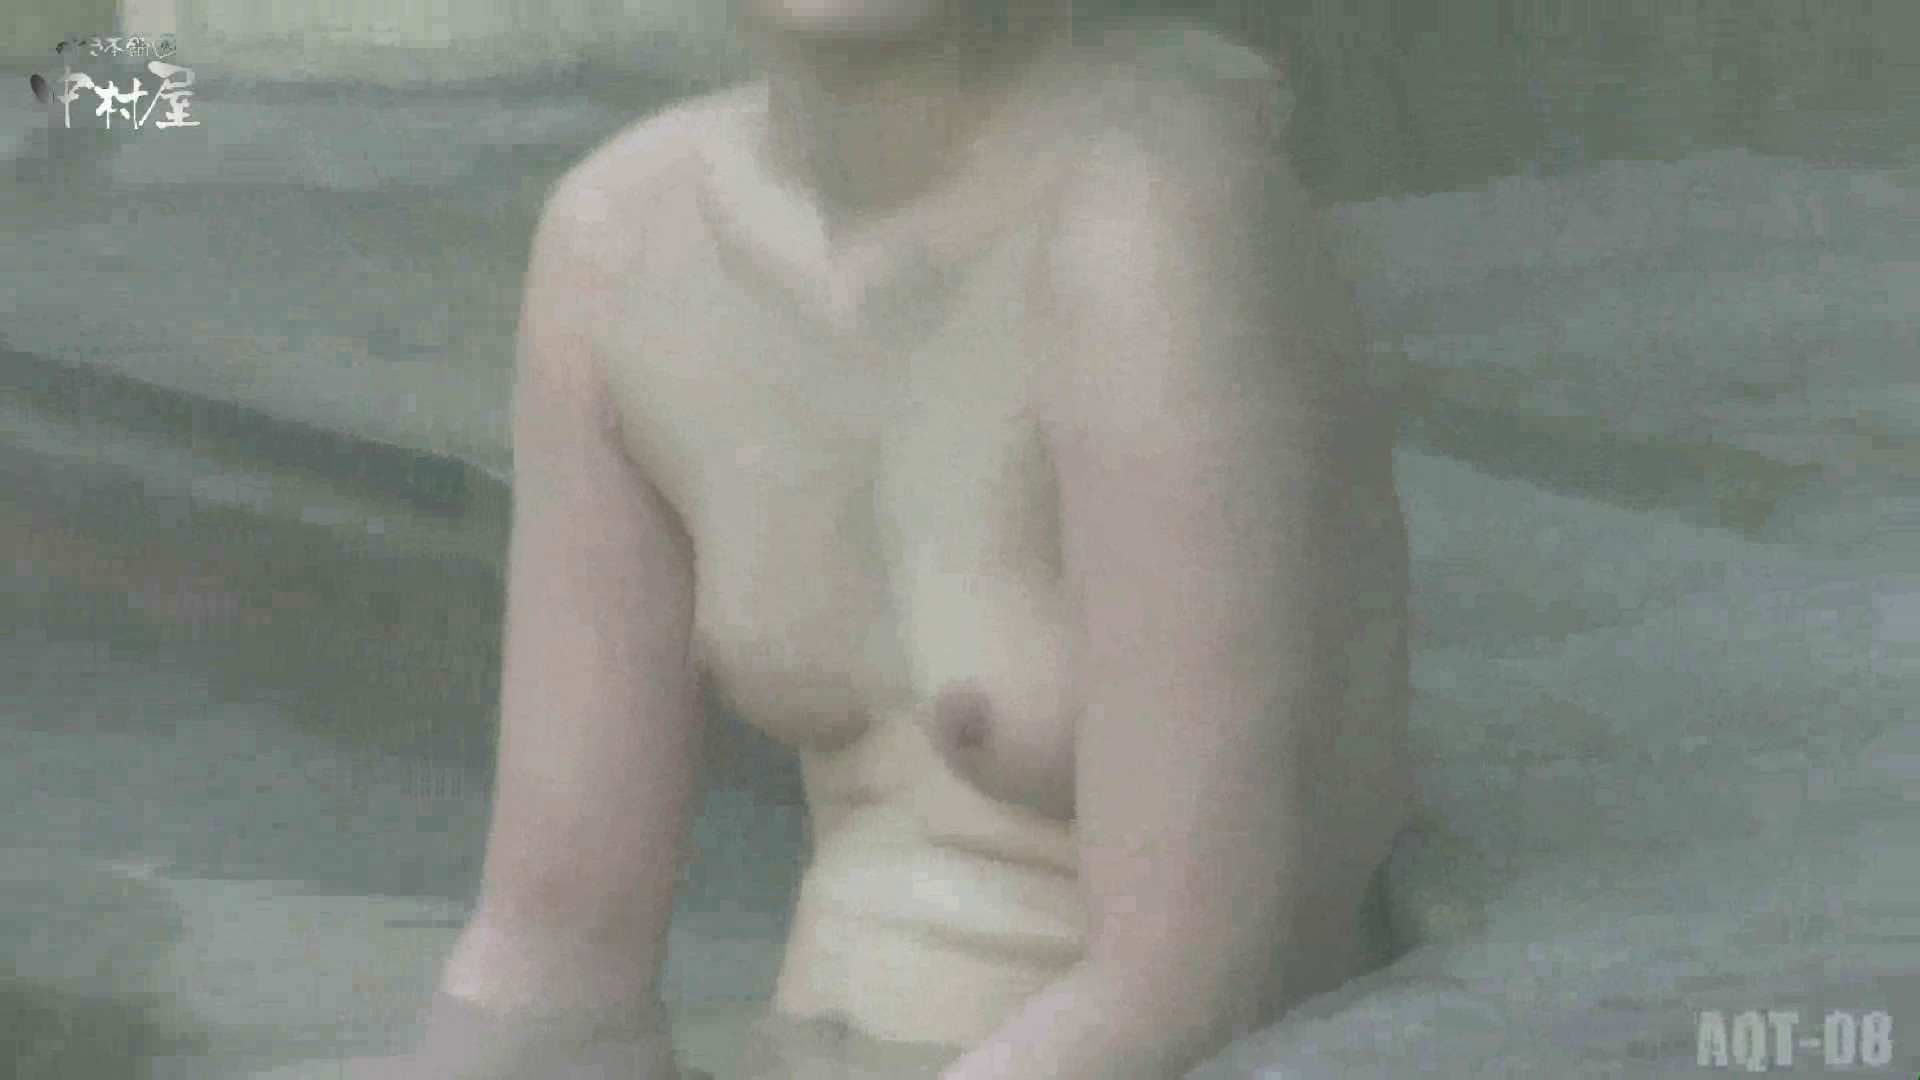 Aquaな露天風呂Vol.872潜入盗撮露天風呂八判湯 其の三 盗撮特集 | 潜入画像  96画像 23